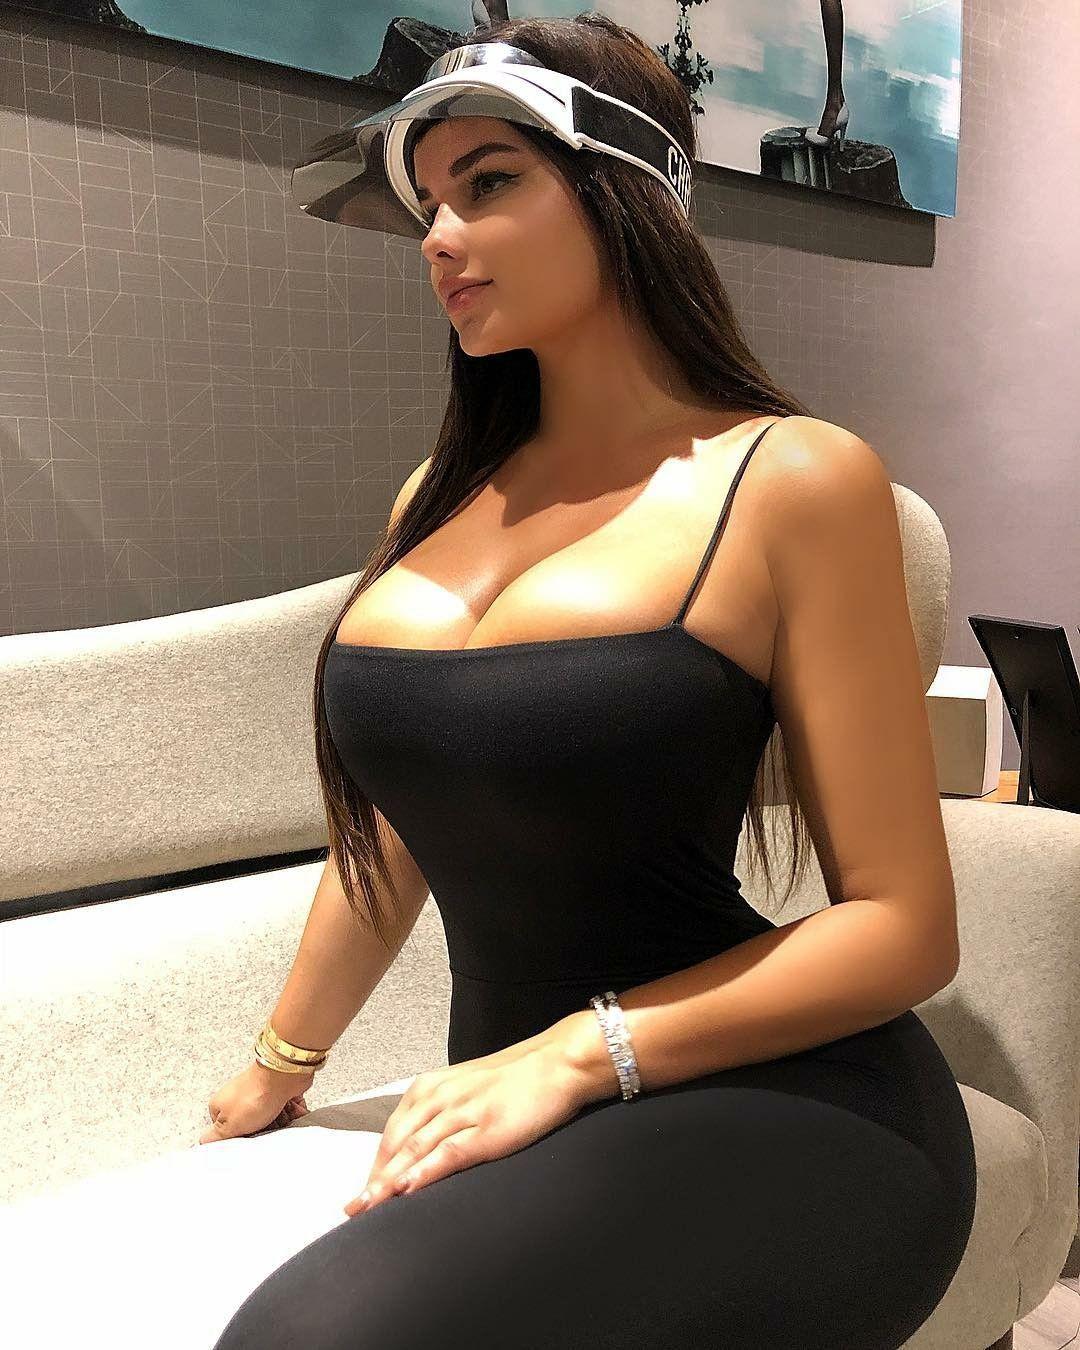 Celebrites Maria Borges nude (51 photo), Sexy, Bikini, Instagram, swimsuit 2015